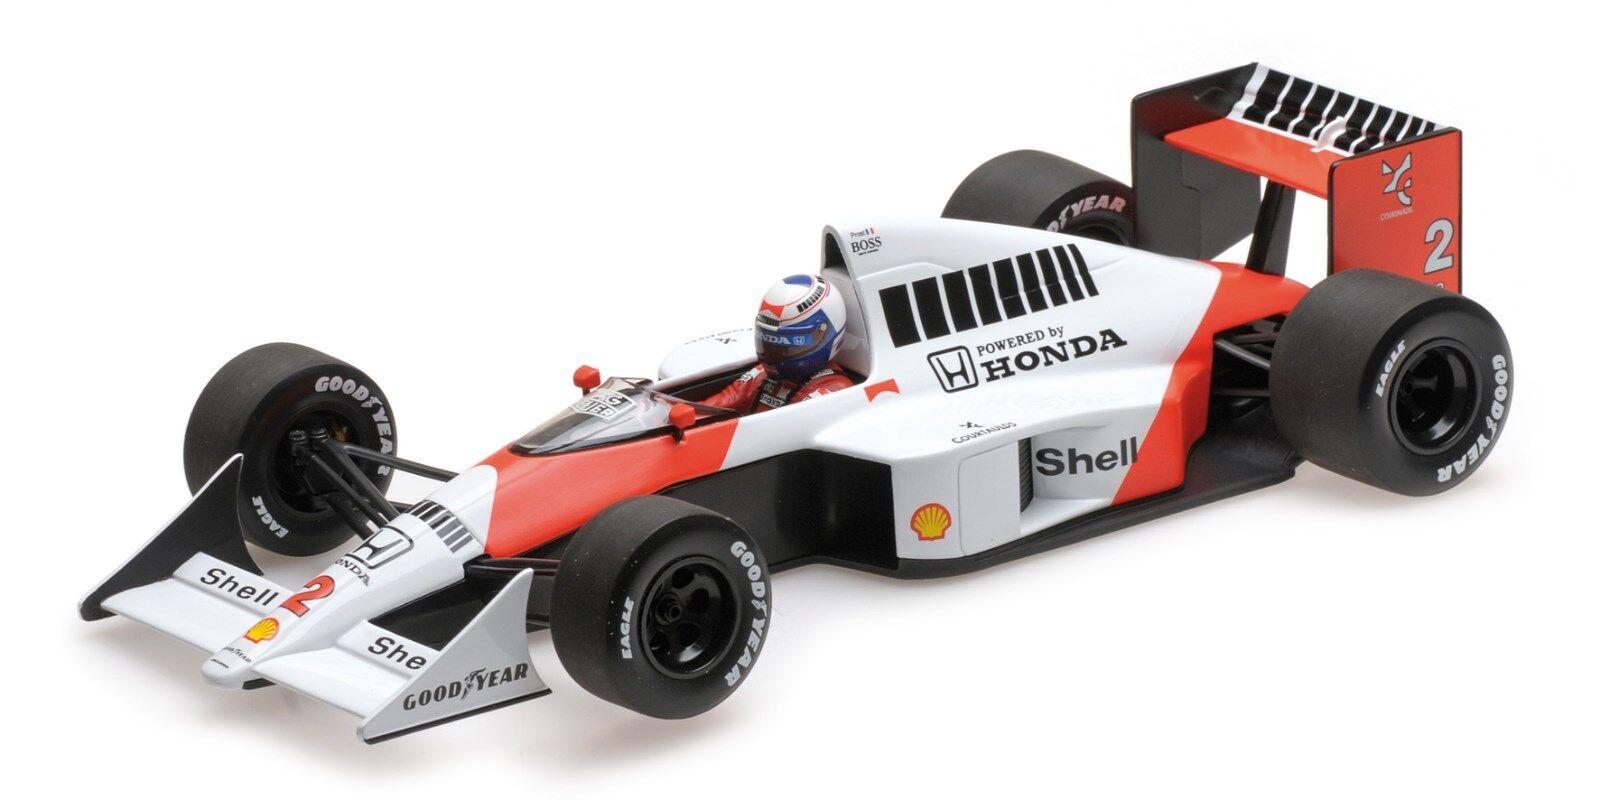 McLaren mp4/5 A. PROST WORLD CHAMPION Weltmeister modello 1989 530891802 1/18 NUOVO